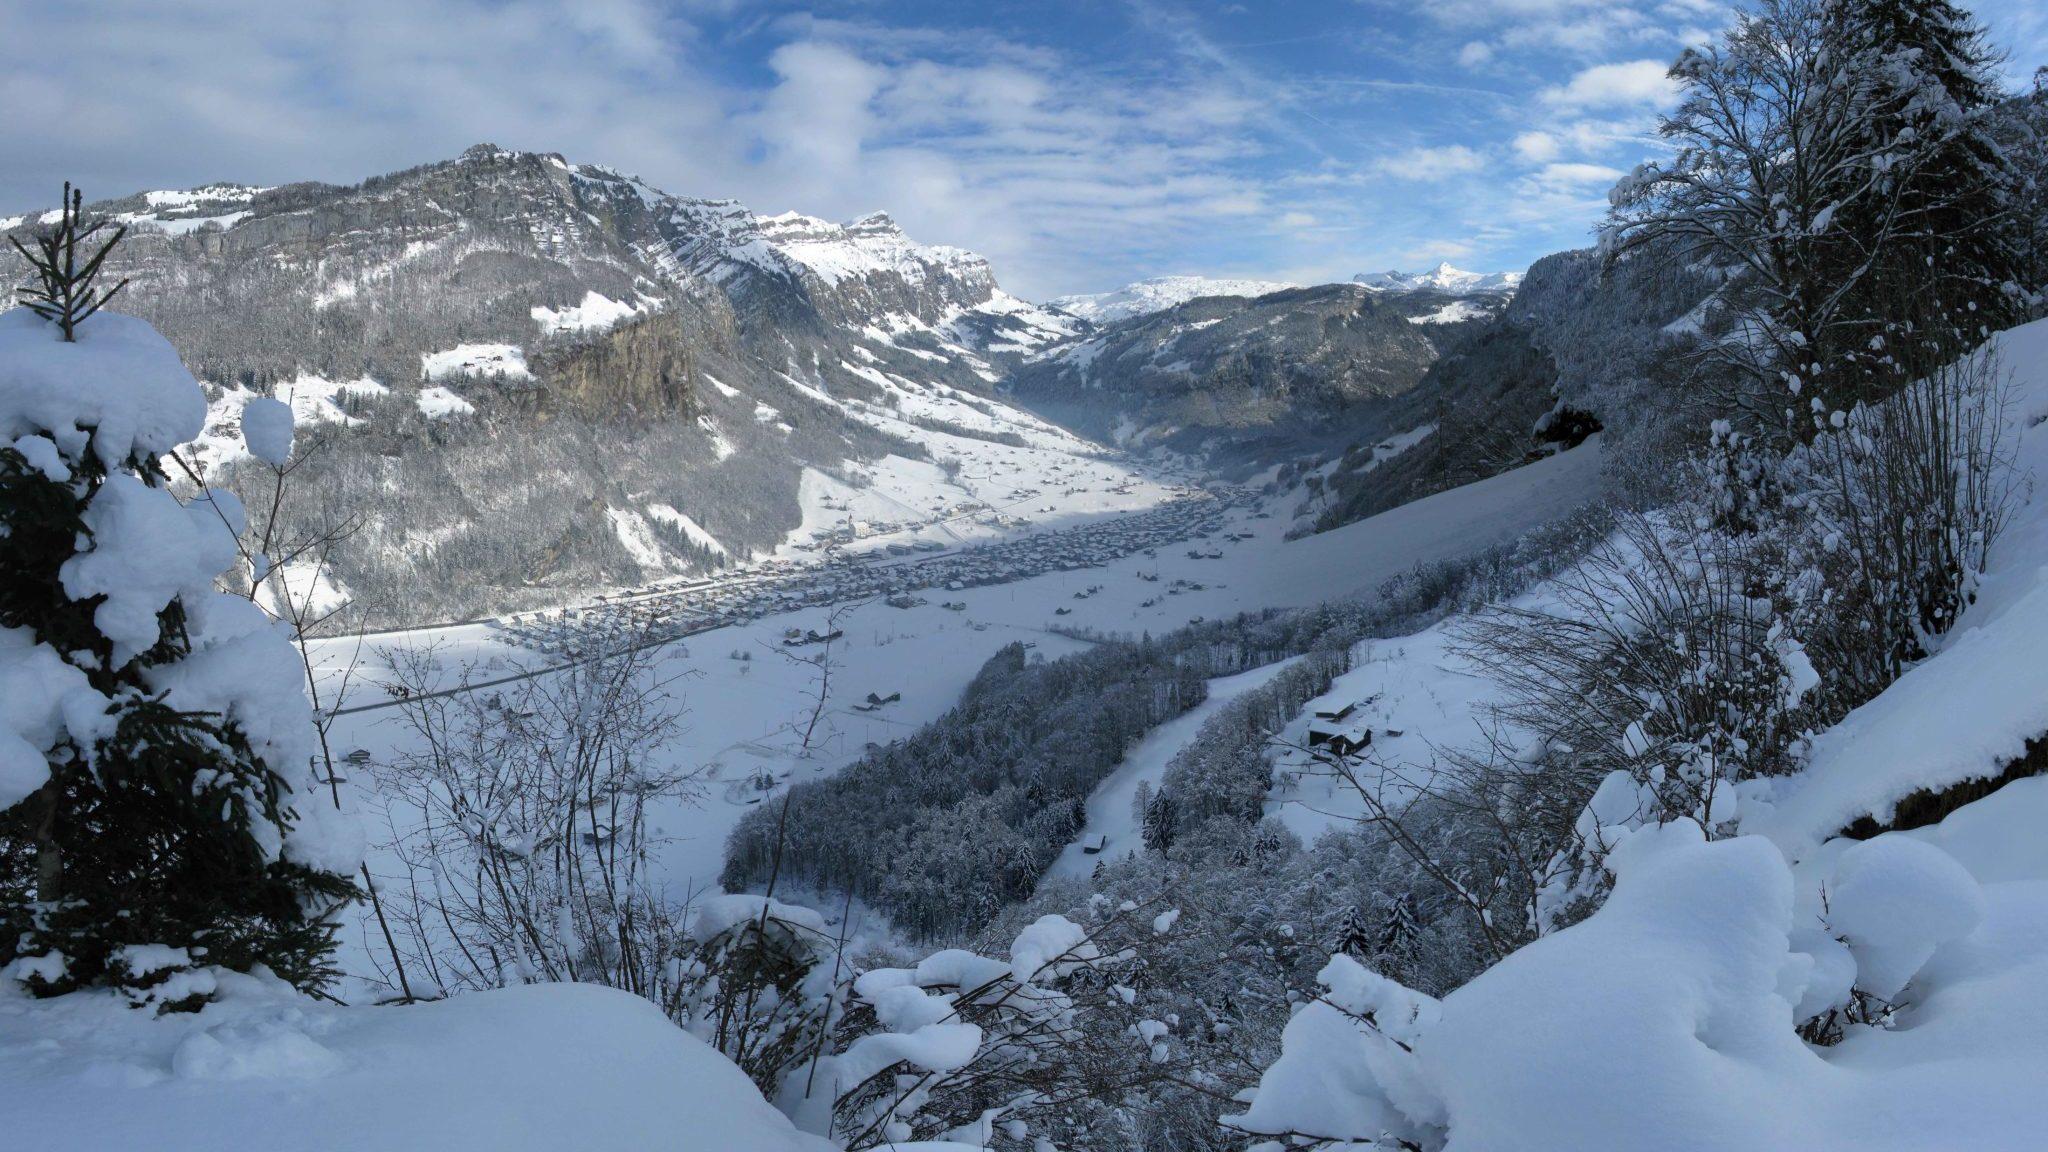 Muotathal im Winter